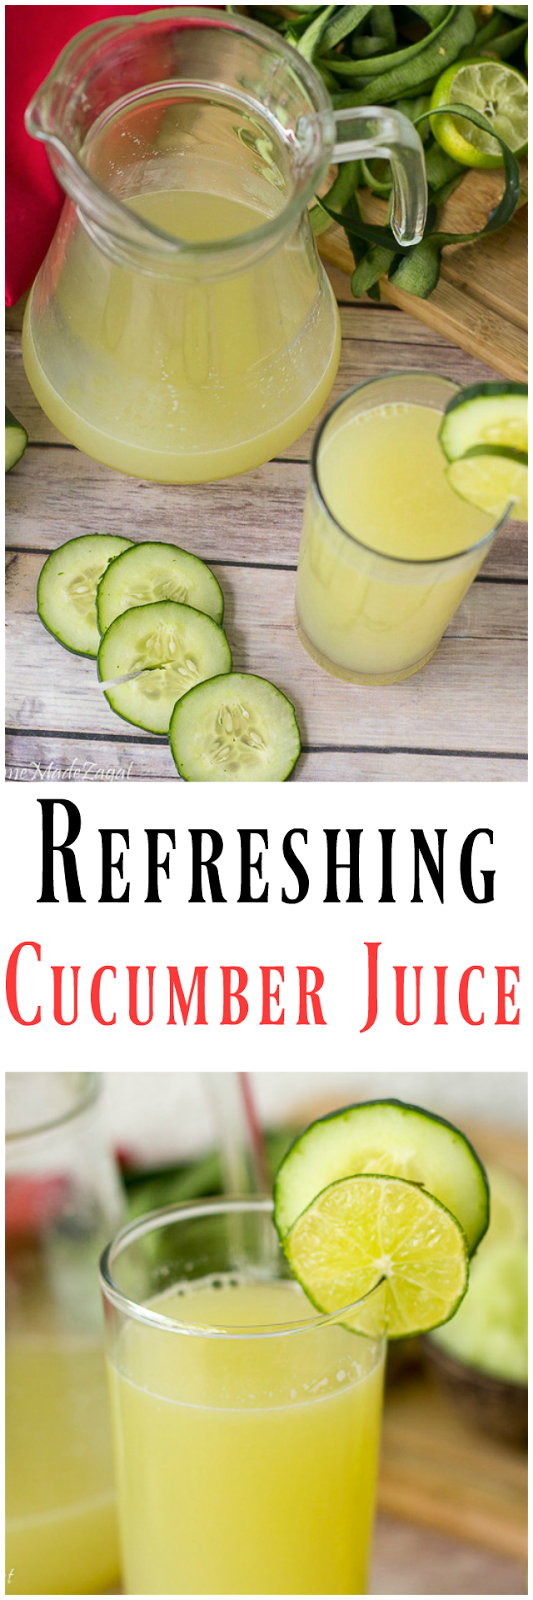 How to Make Cucumber Juice photo